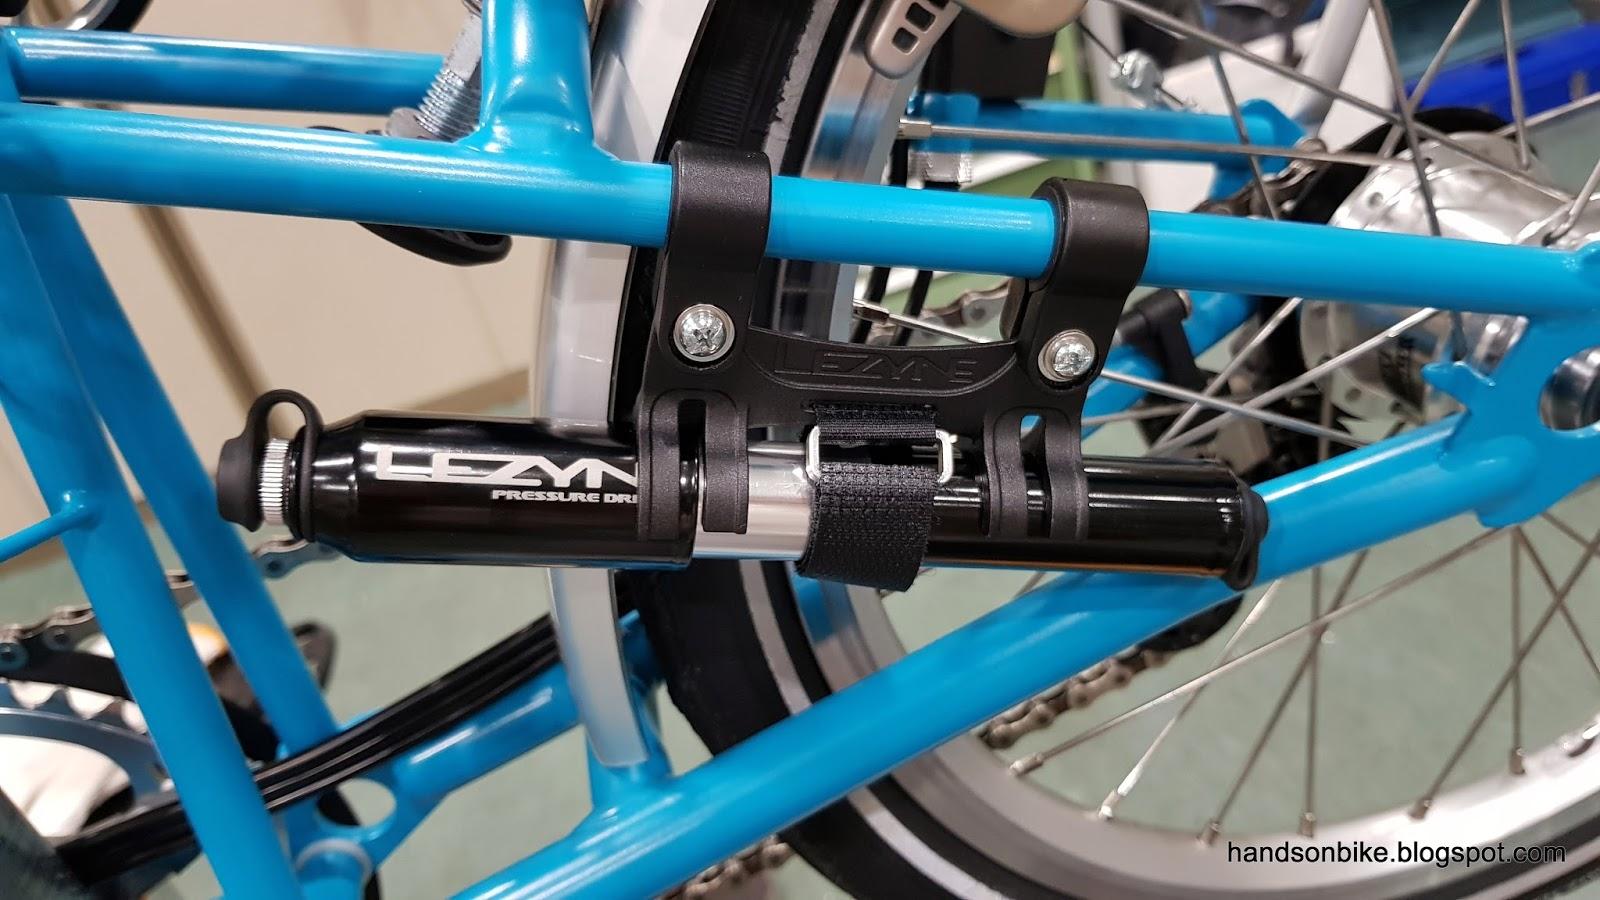 Hands On Bike: Brompton M6R: DIY Lezyne Pump Mount and Tool Bag